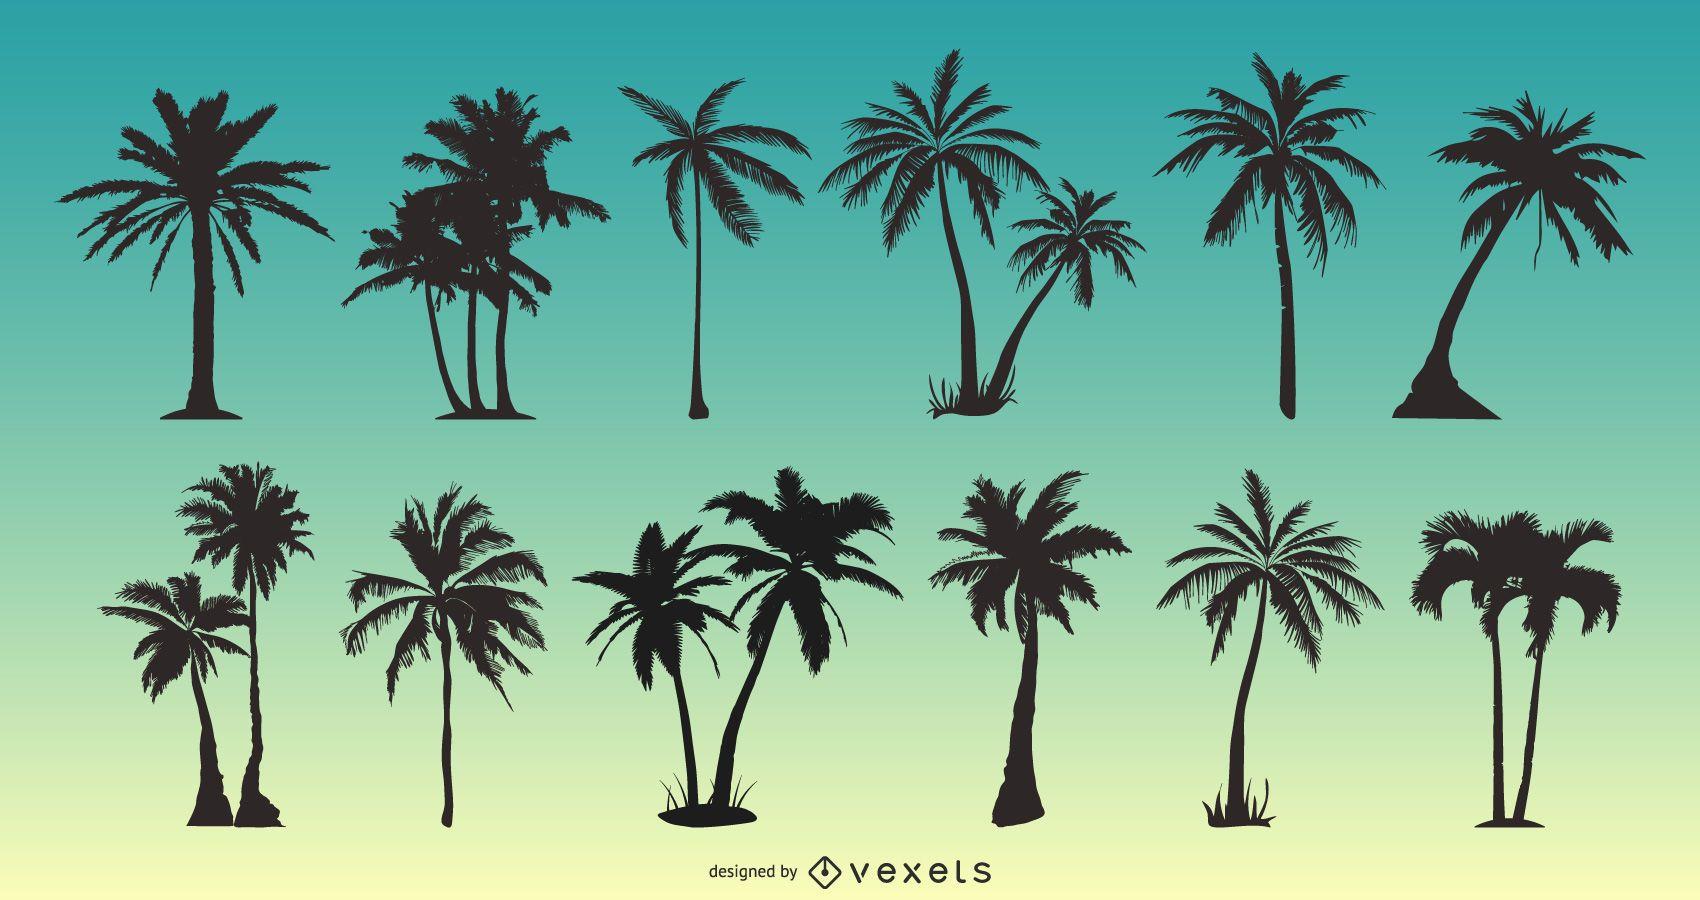 Pacote Palm Tree Silhouette